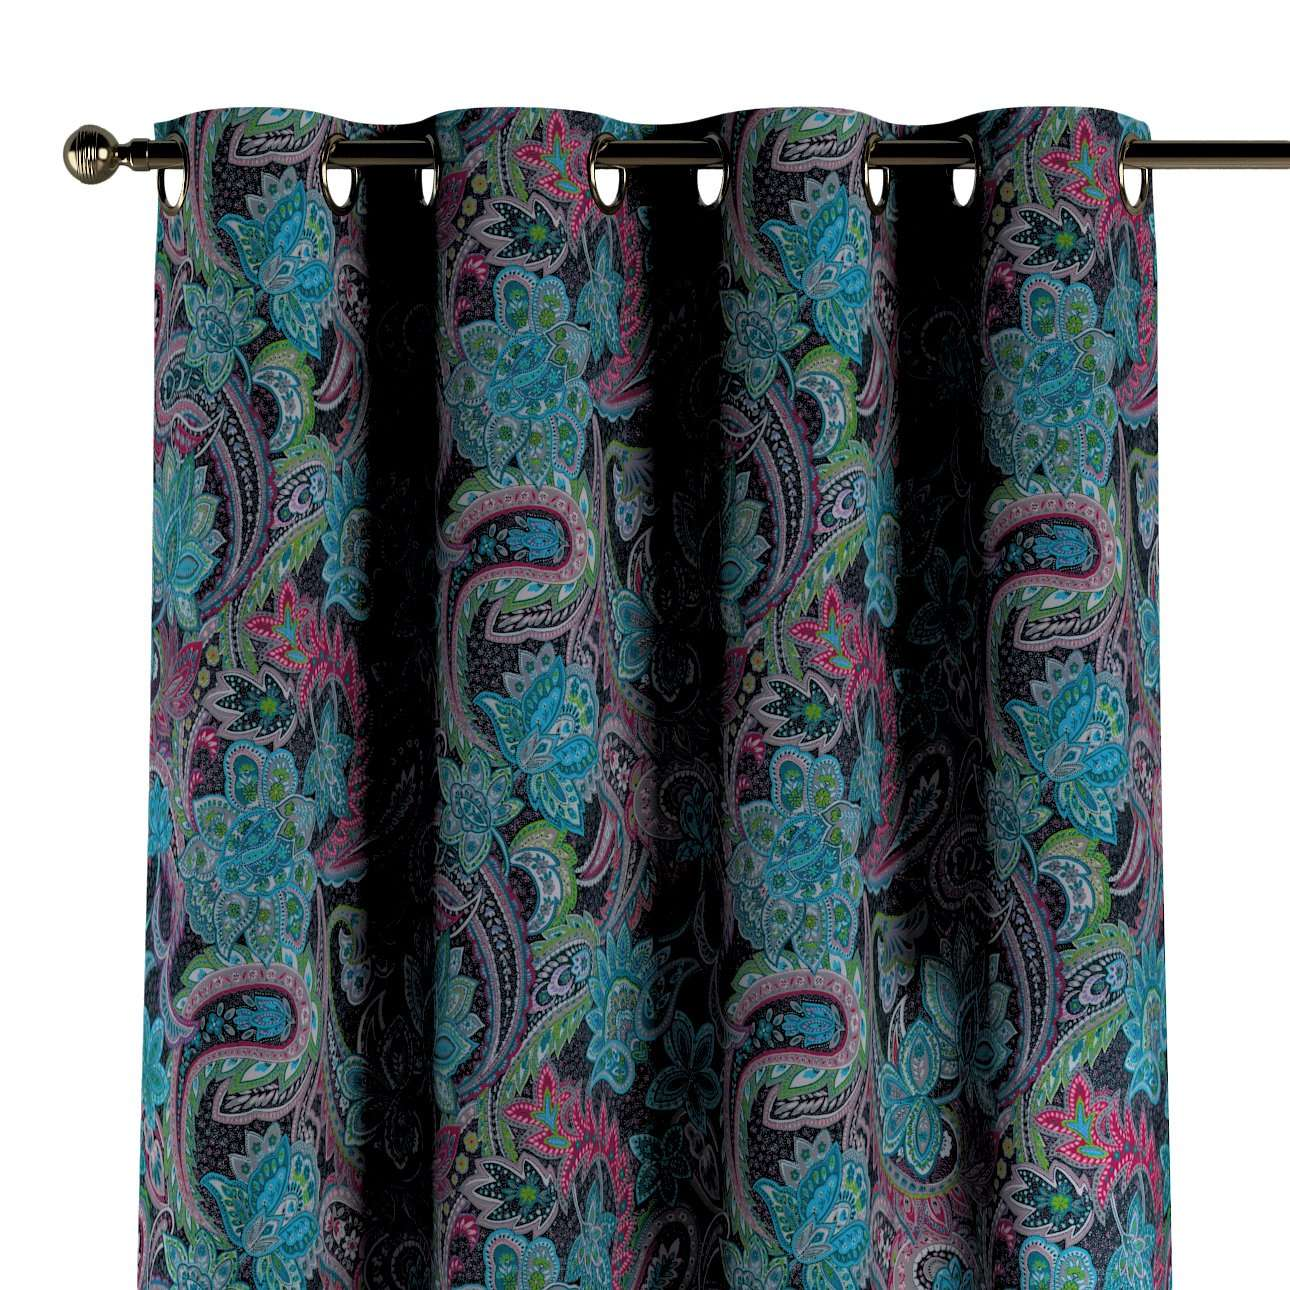 Zasłona na kółkach 1 szt. w kolekcji Velvet, tkanina: 704-22